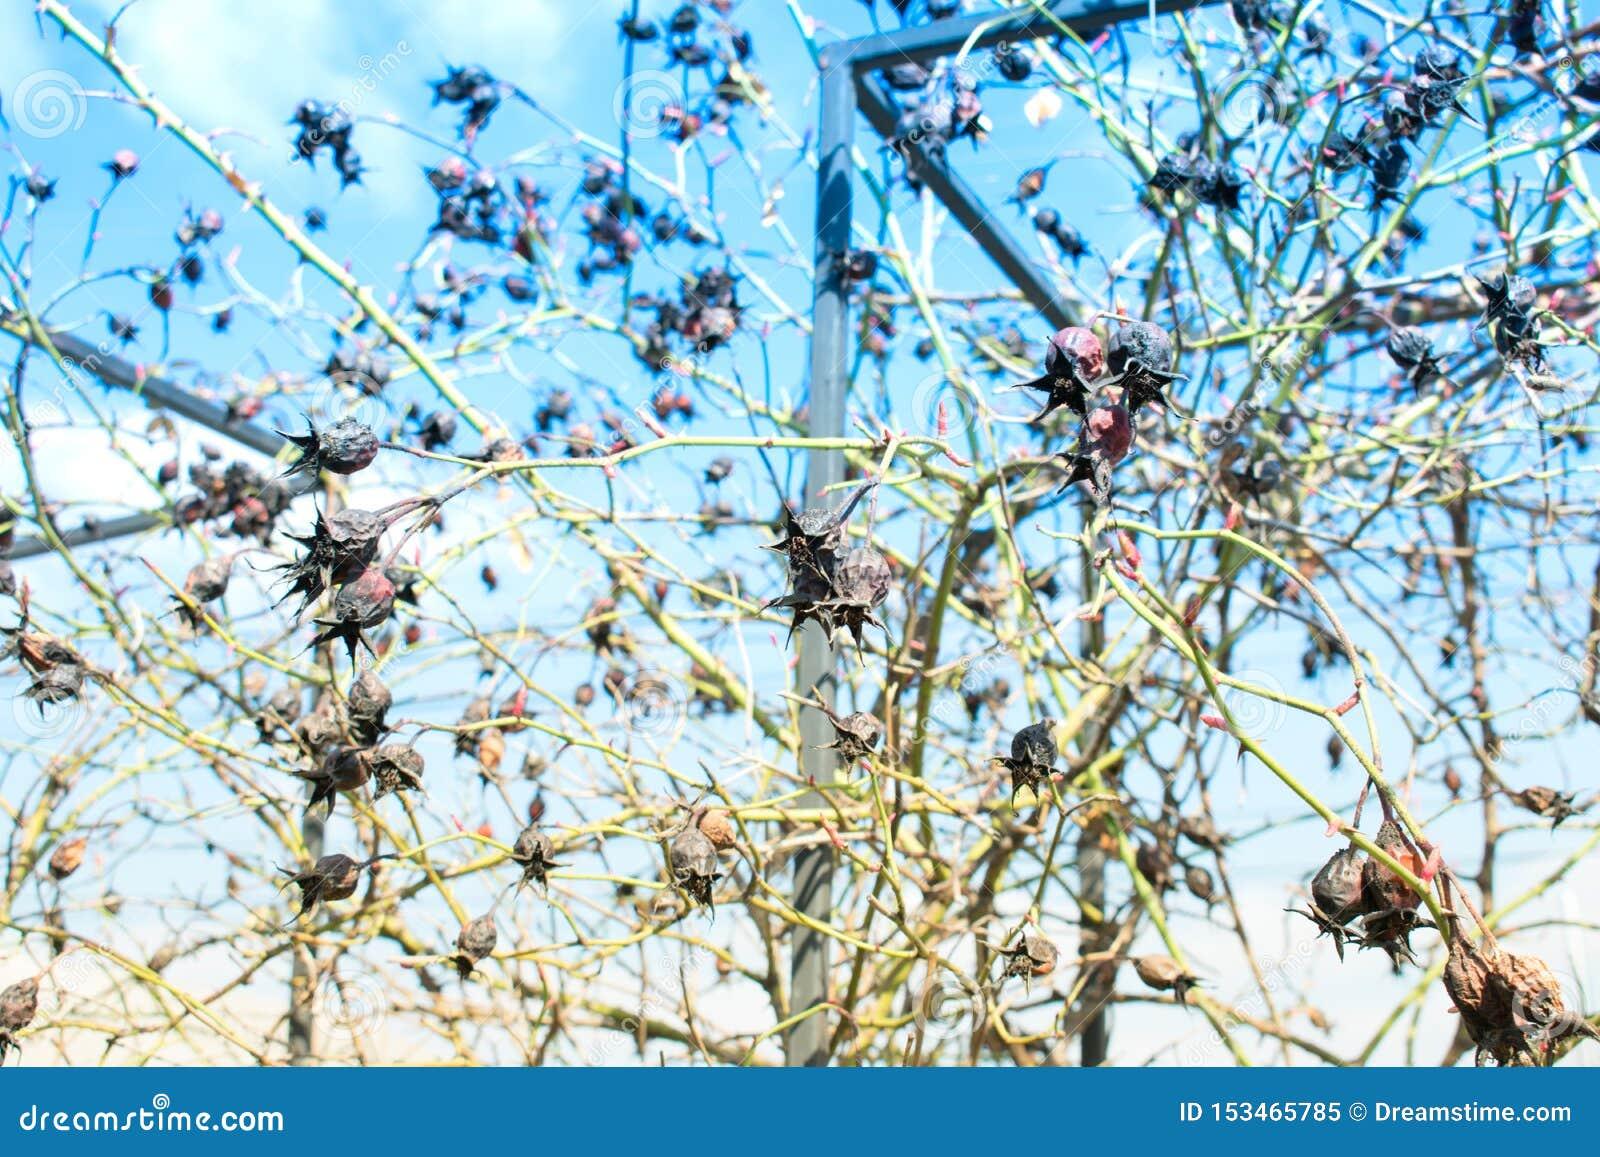 Trockene wilde spinnende Rose der Hagebutte im Herbst